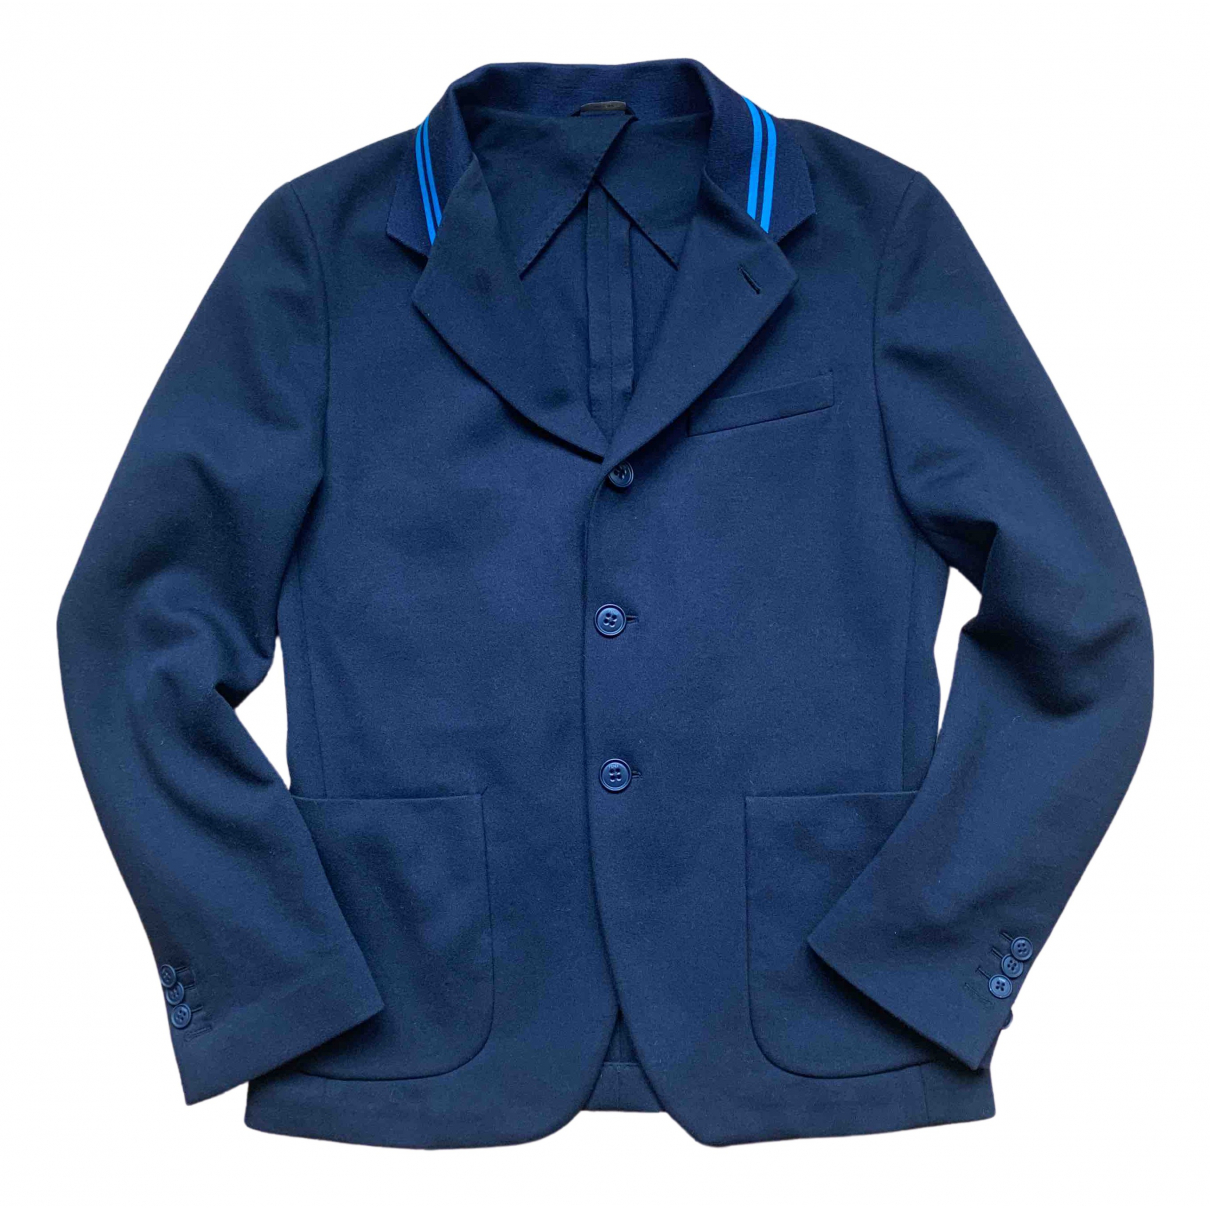 Fendi \N Navy jacket  for Men 48 IT